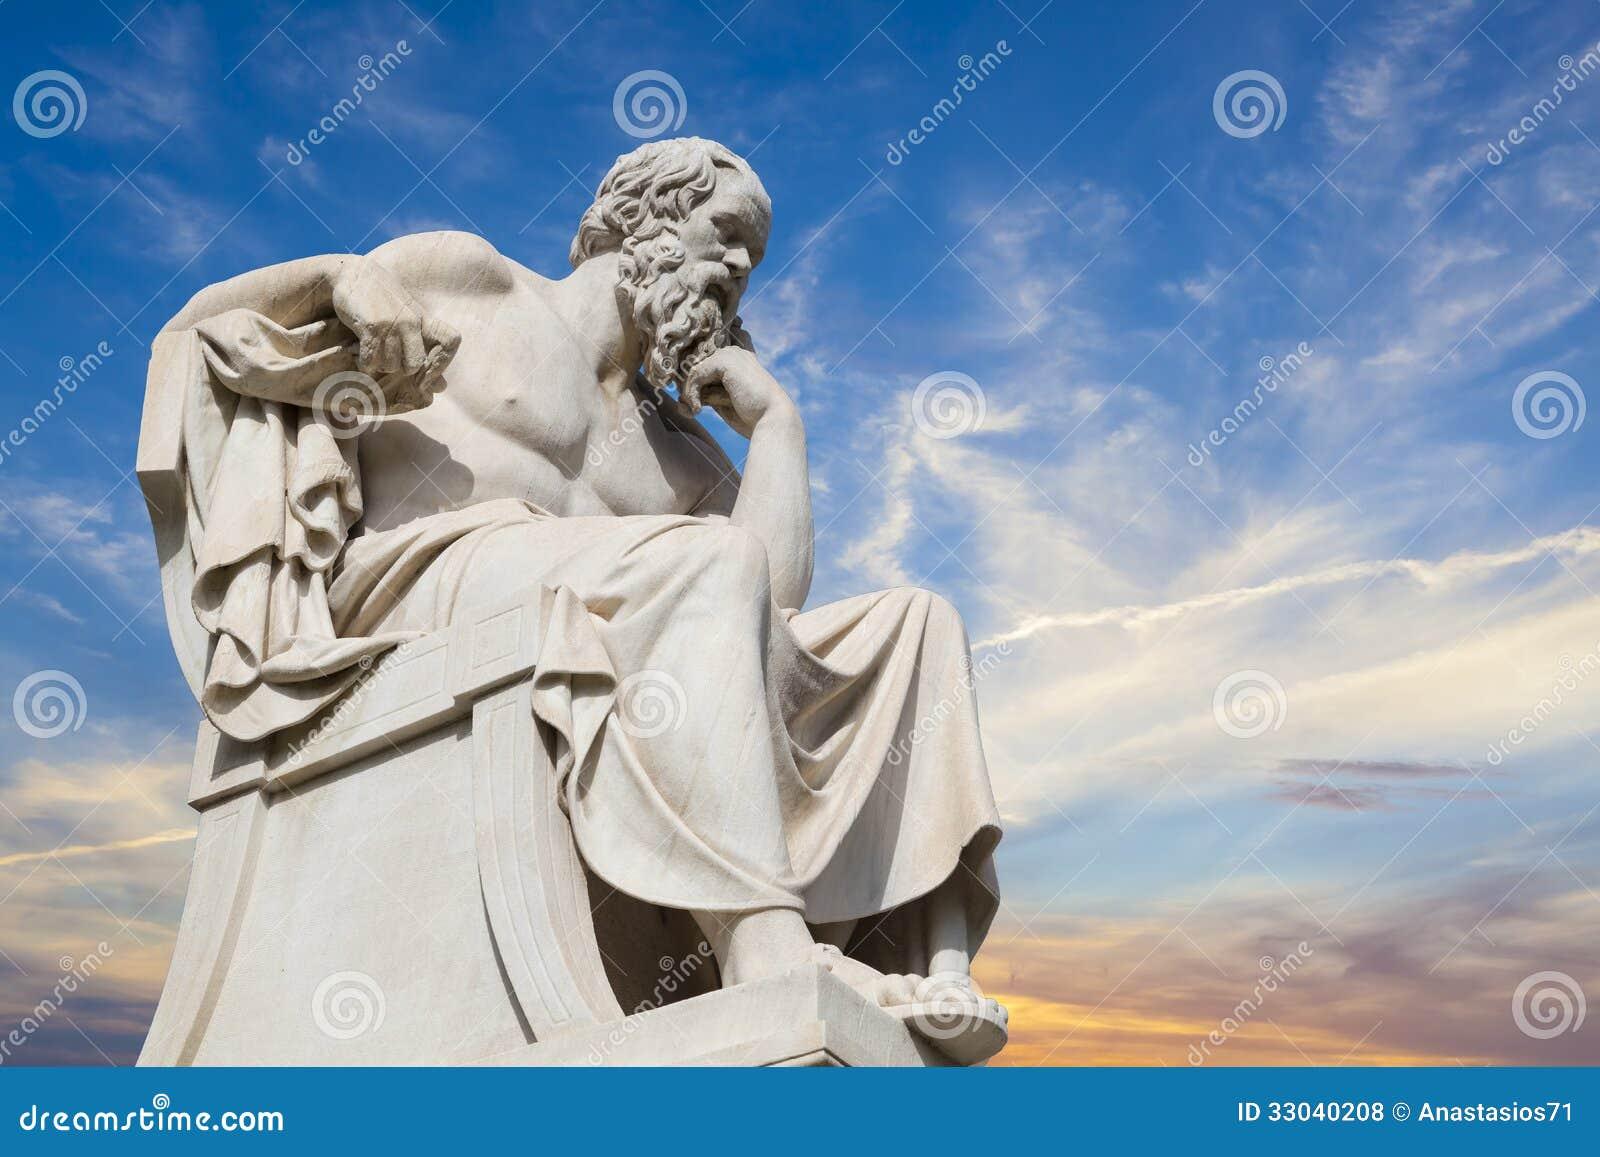 Socrates, philosophe du grec ancien